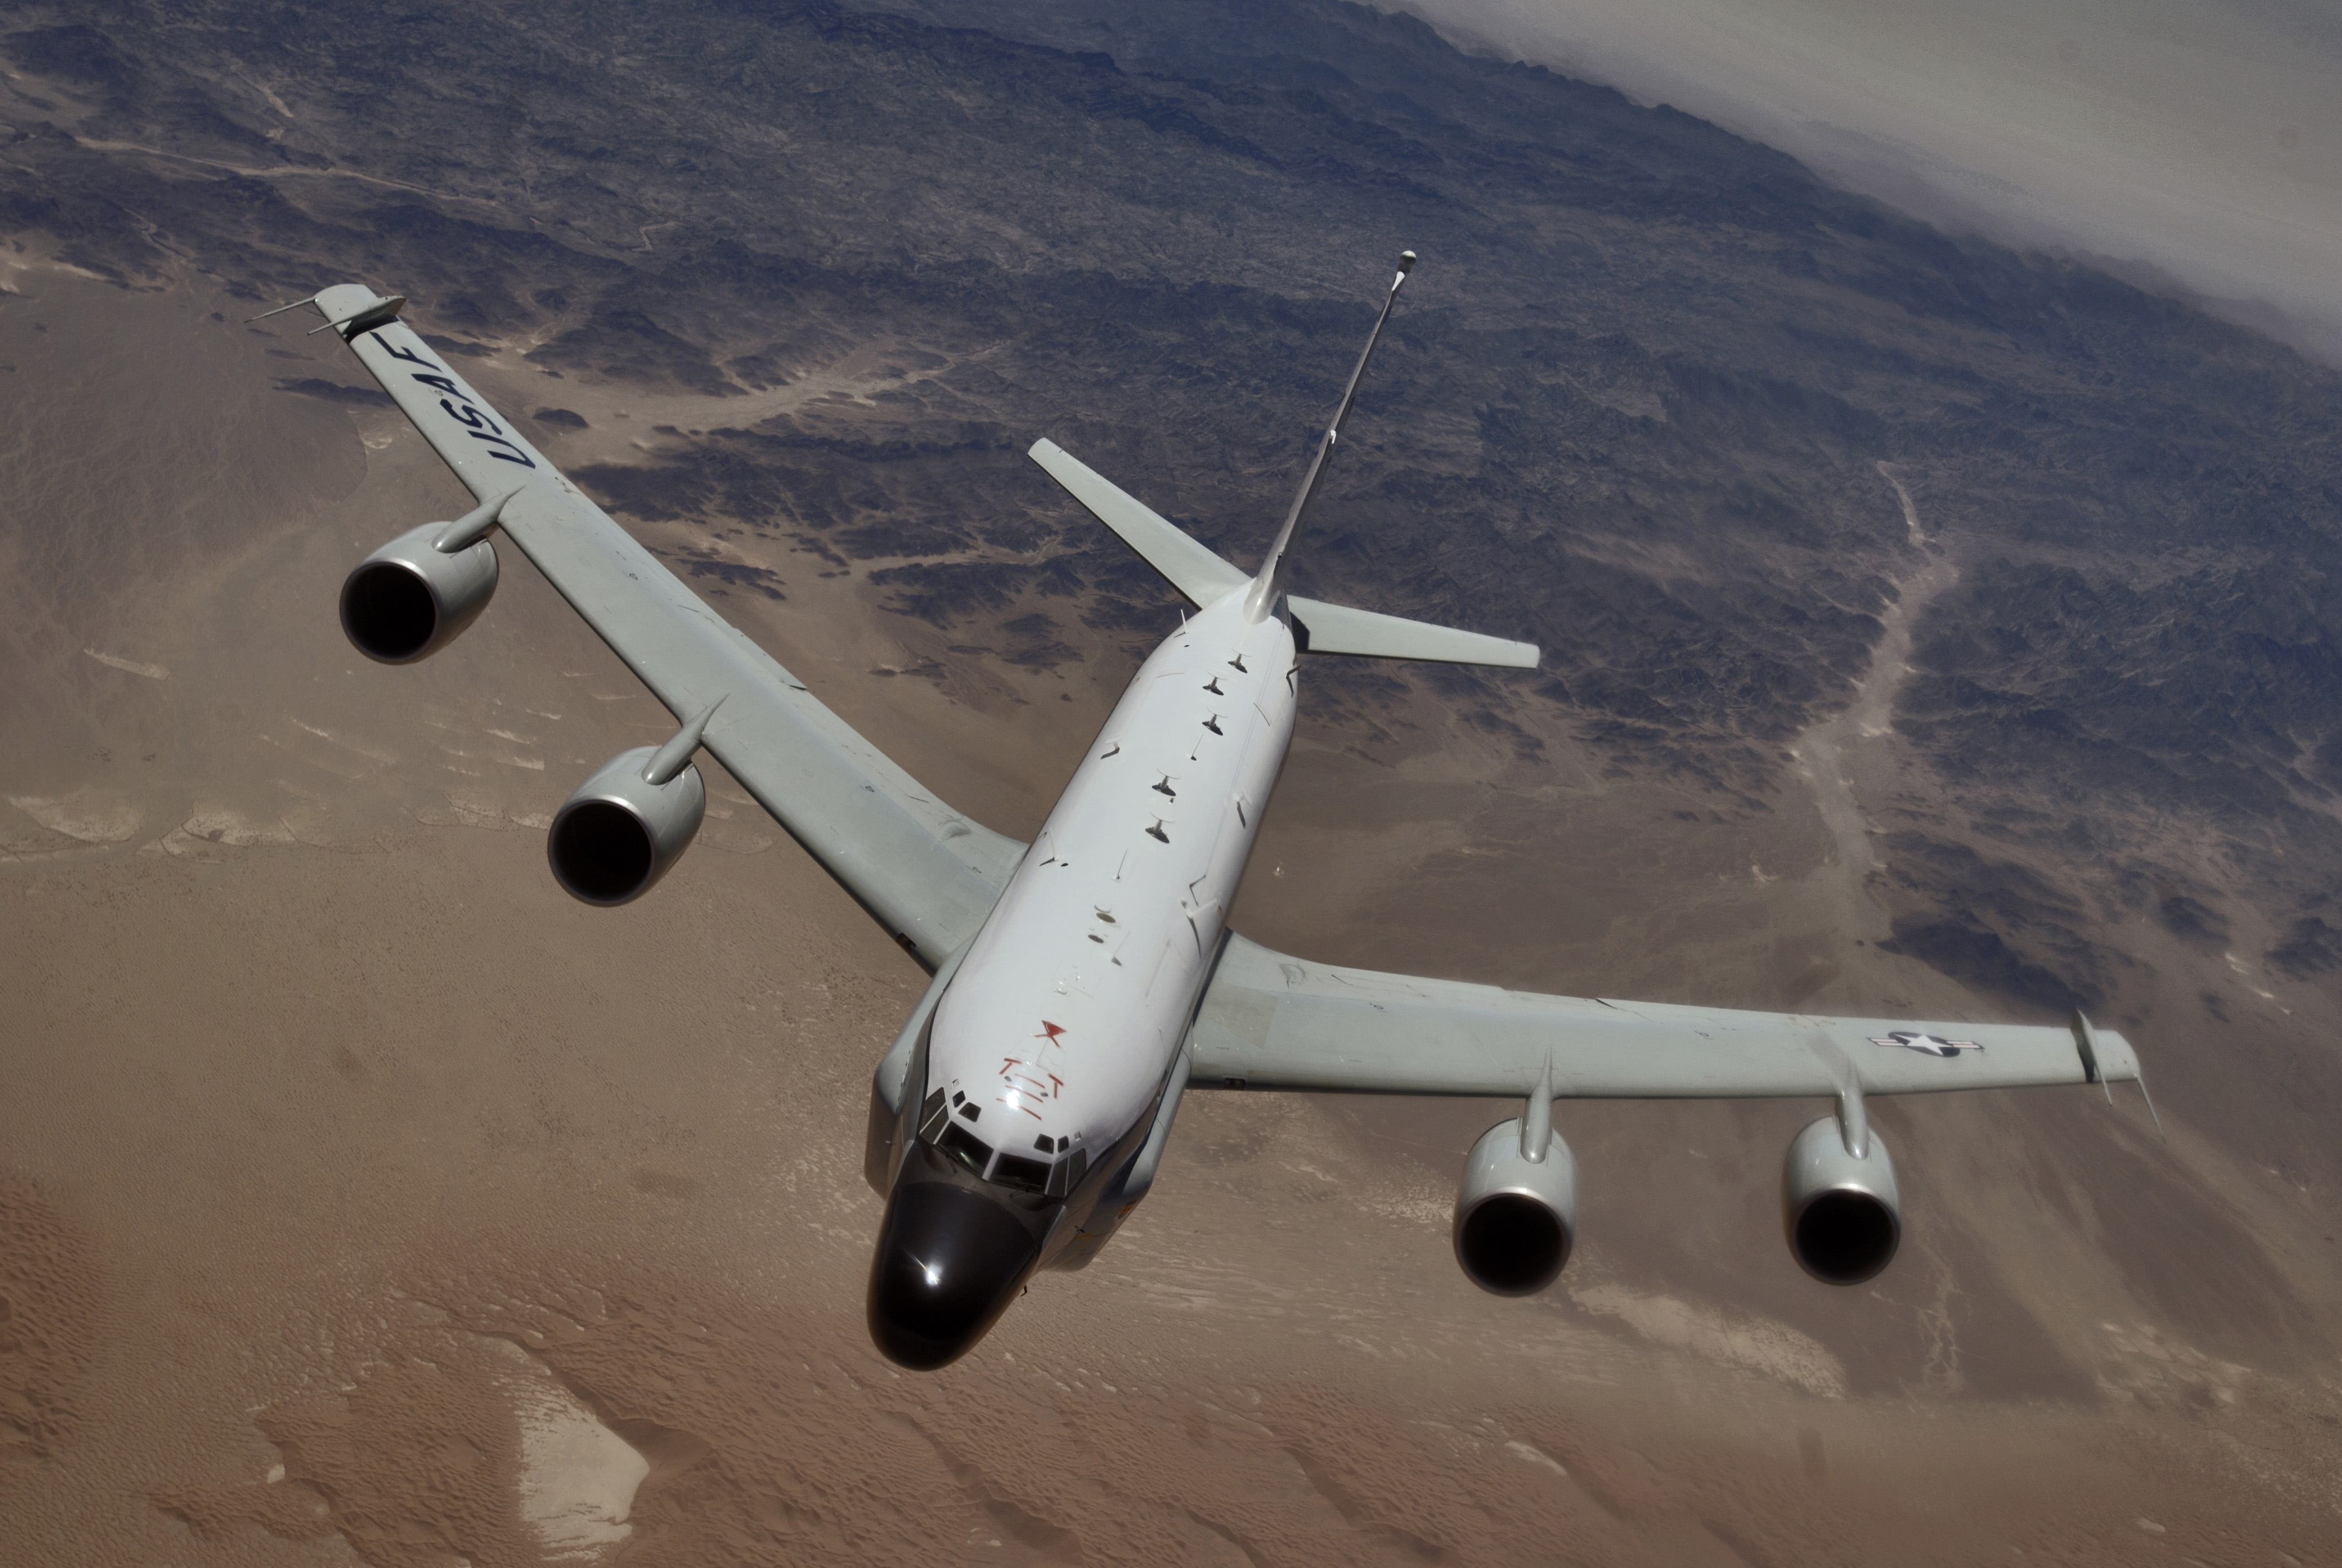 Provokasi, Pesawat Mata-mata AS Sembilan Kali Dekati Perbatasan Rusia